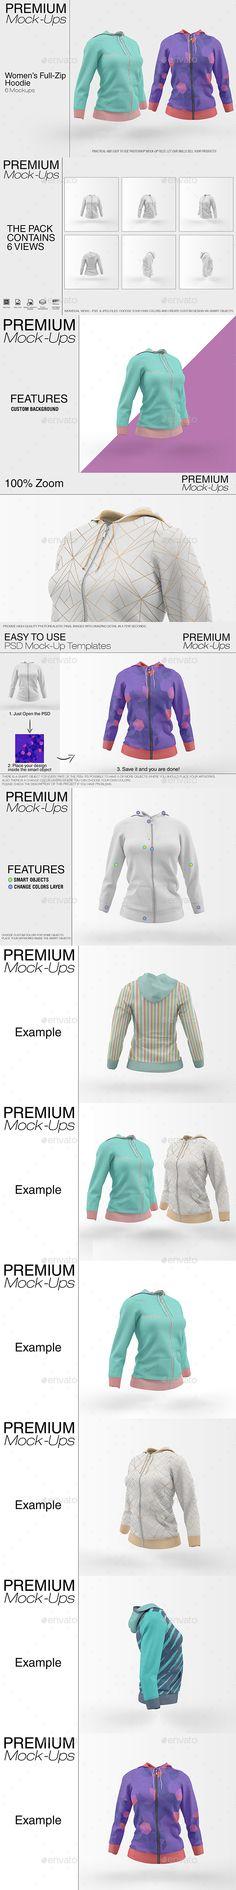 Women's Full-Zip Hoodie #Mockup - Print Product Mock-Ups